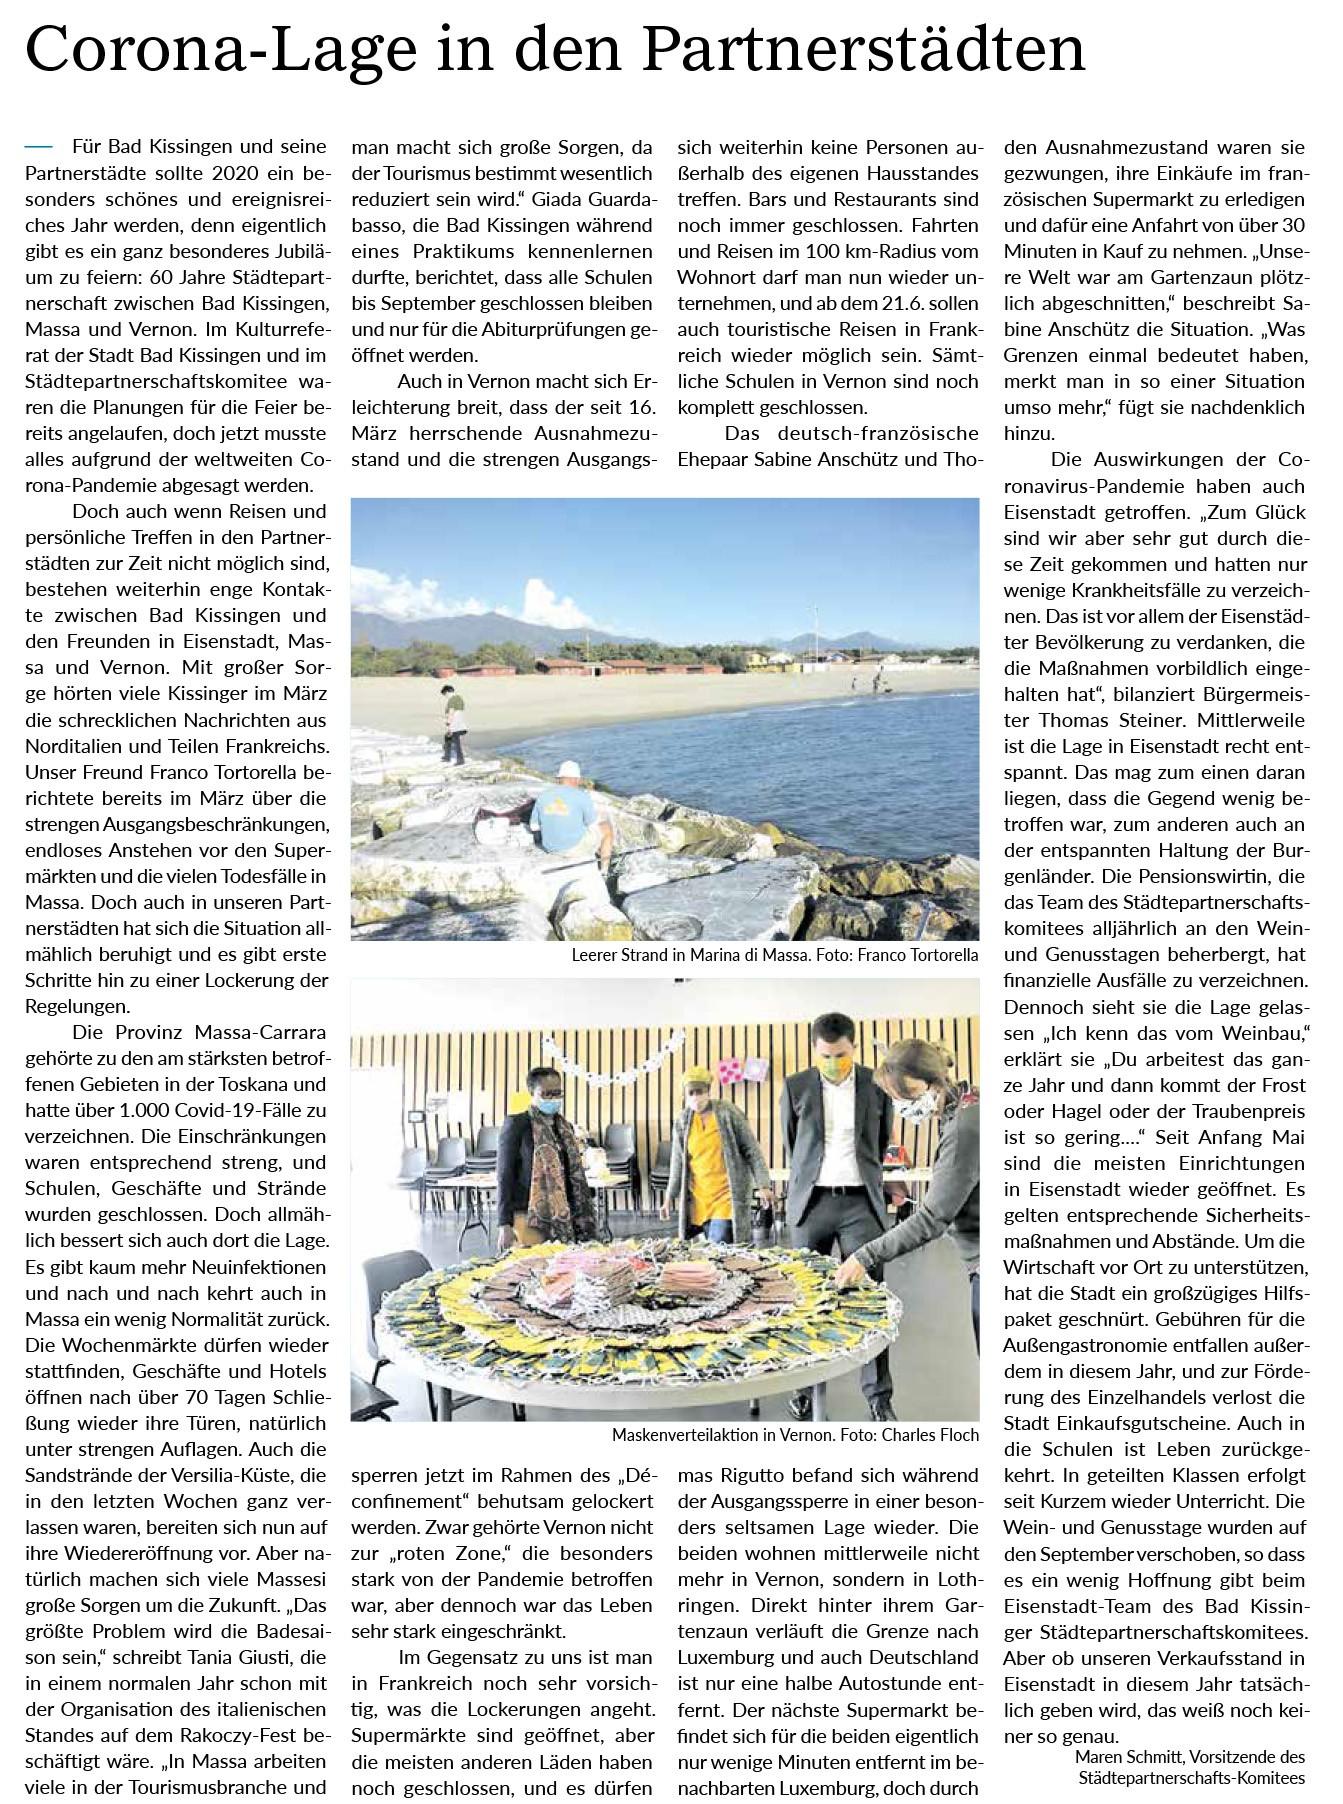 119493_stadtblatt3_2020_web.pdf#page=26